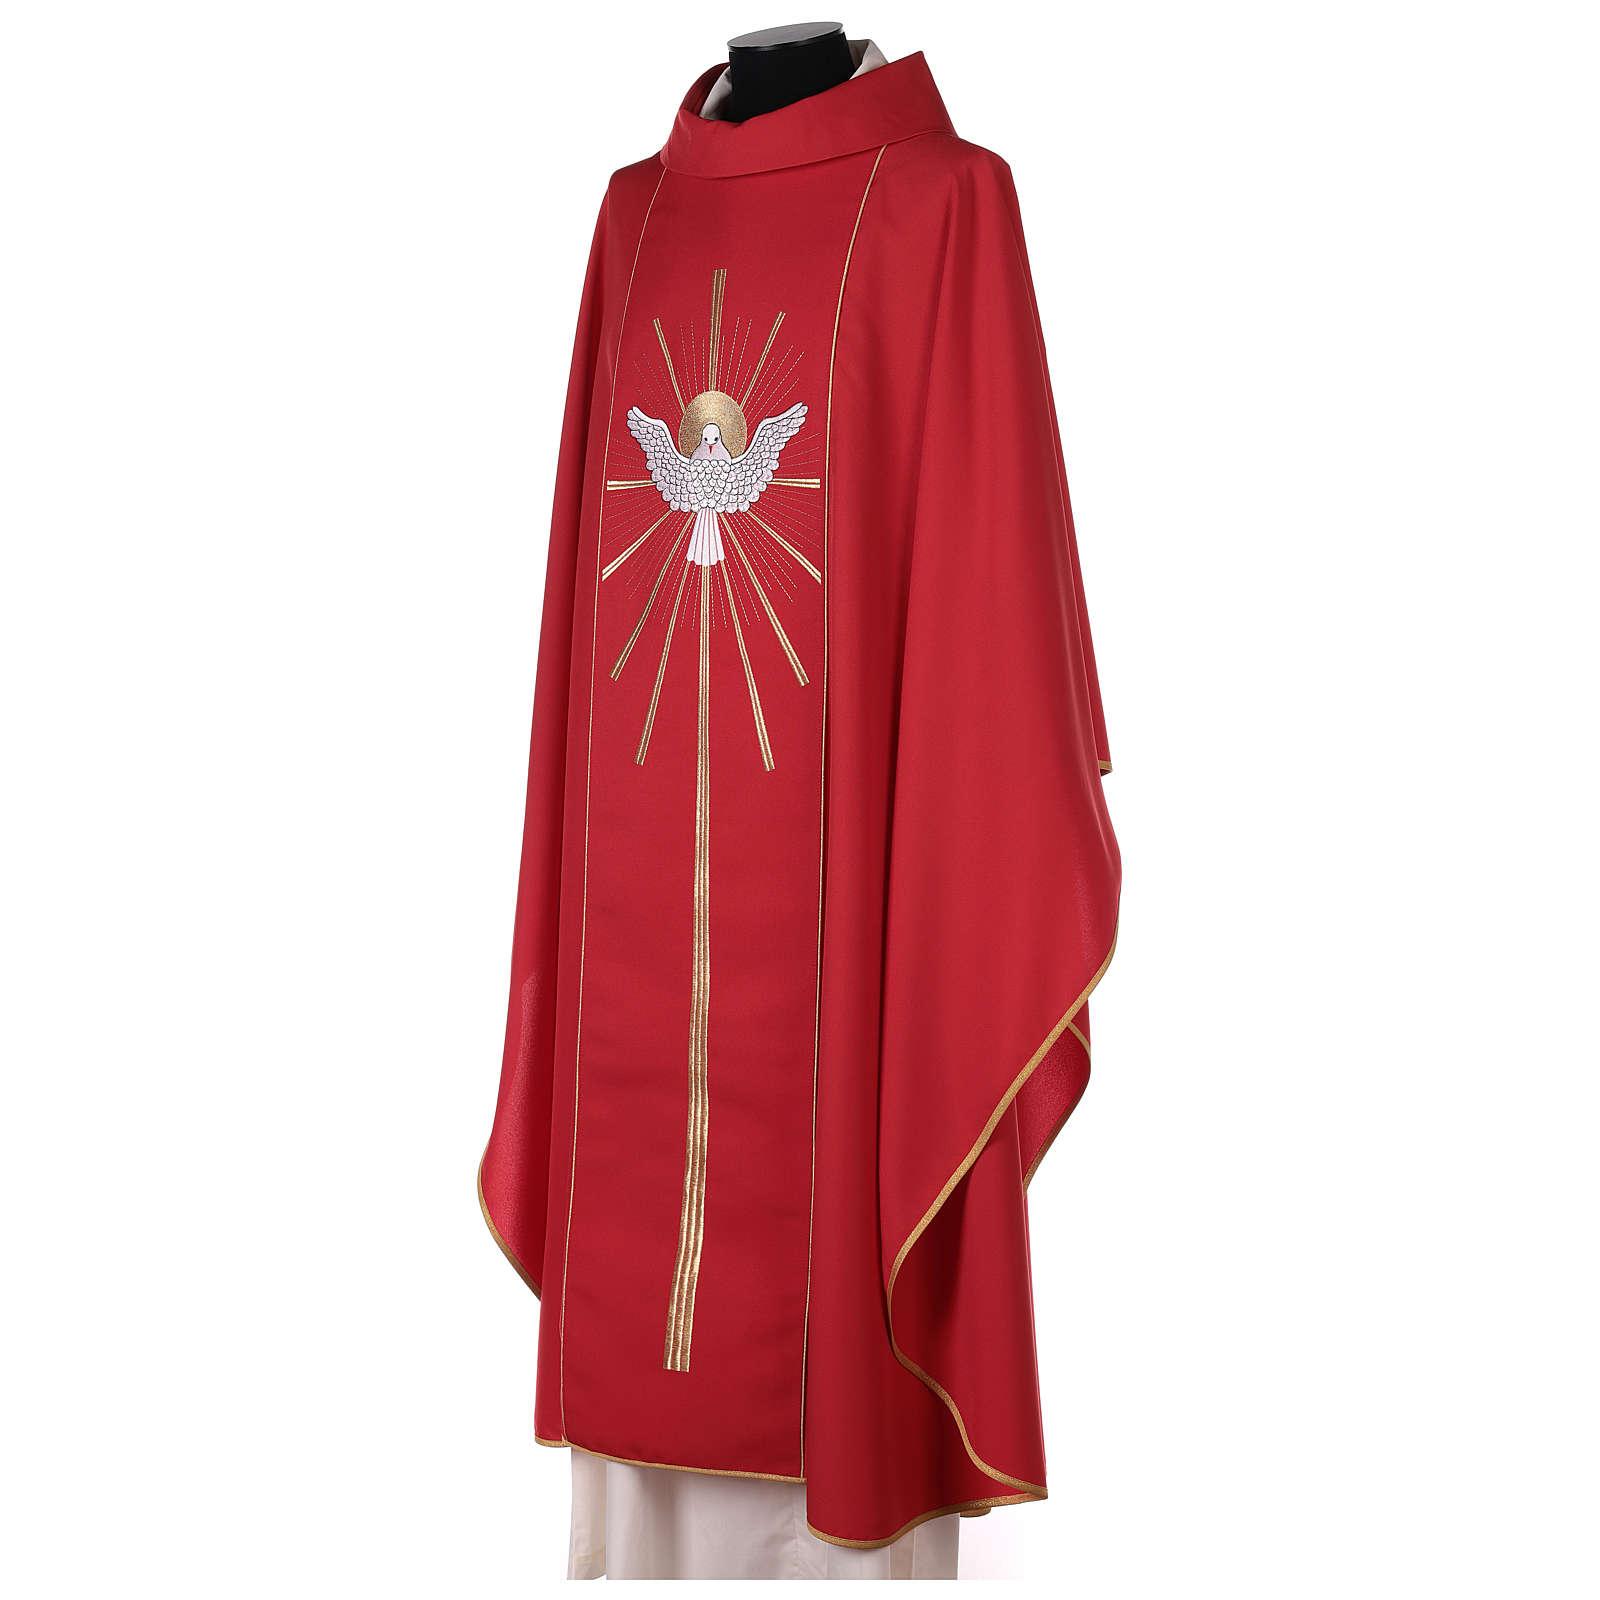 Casula rossa con Spirito Santo e fiamme 4